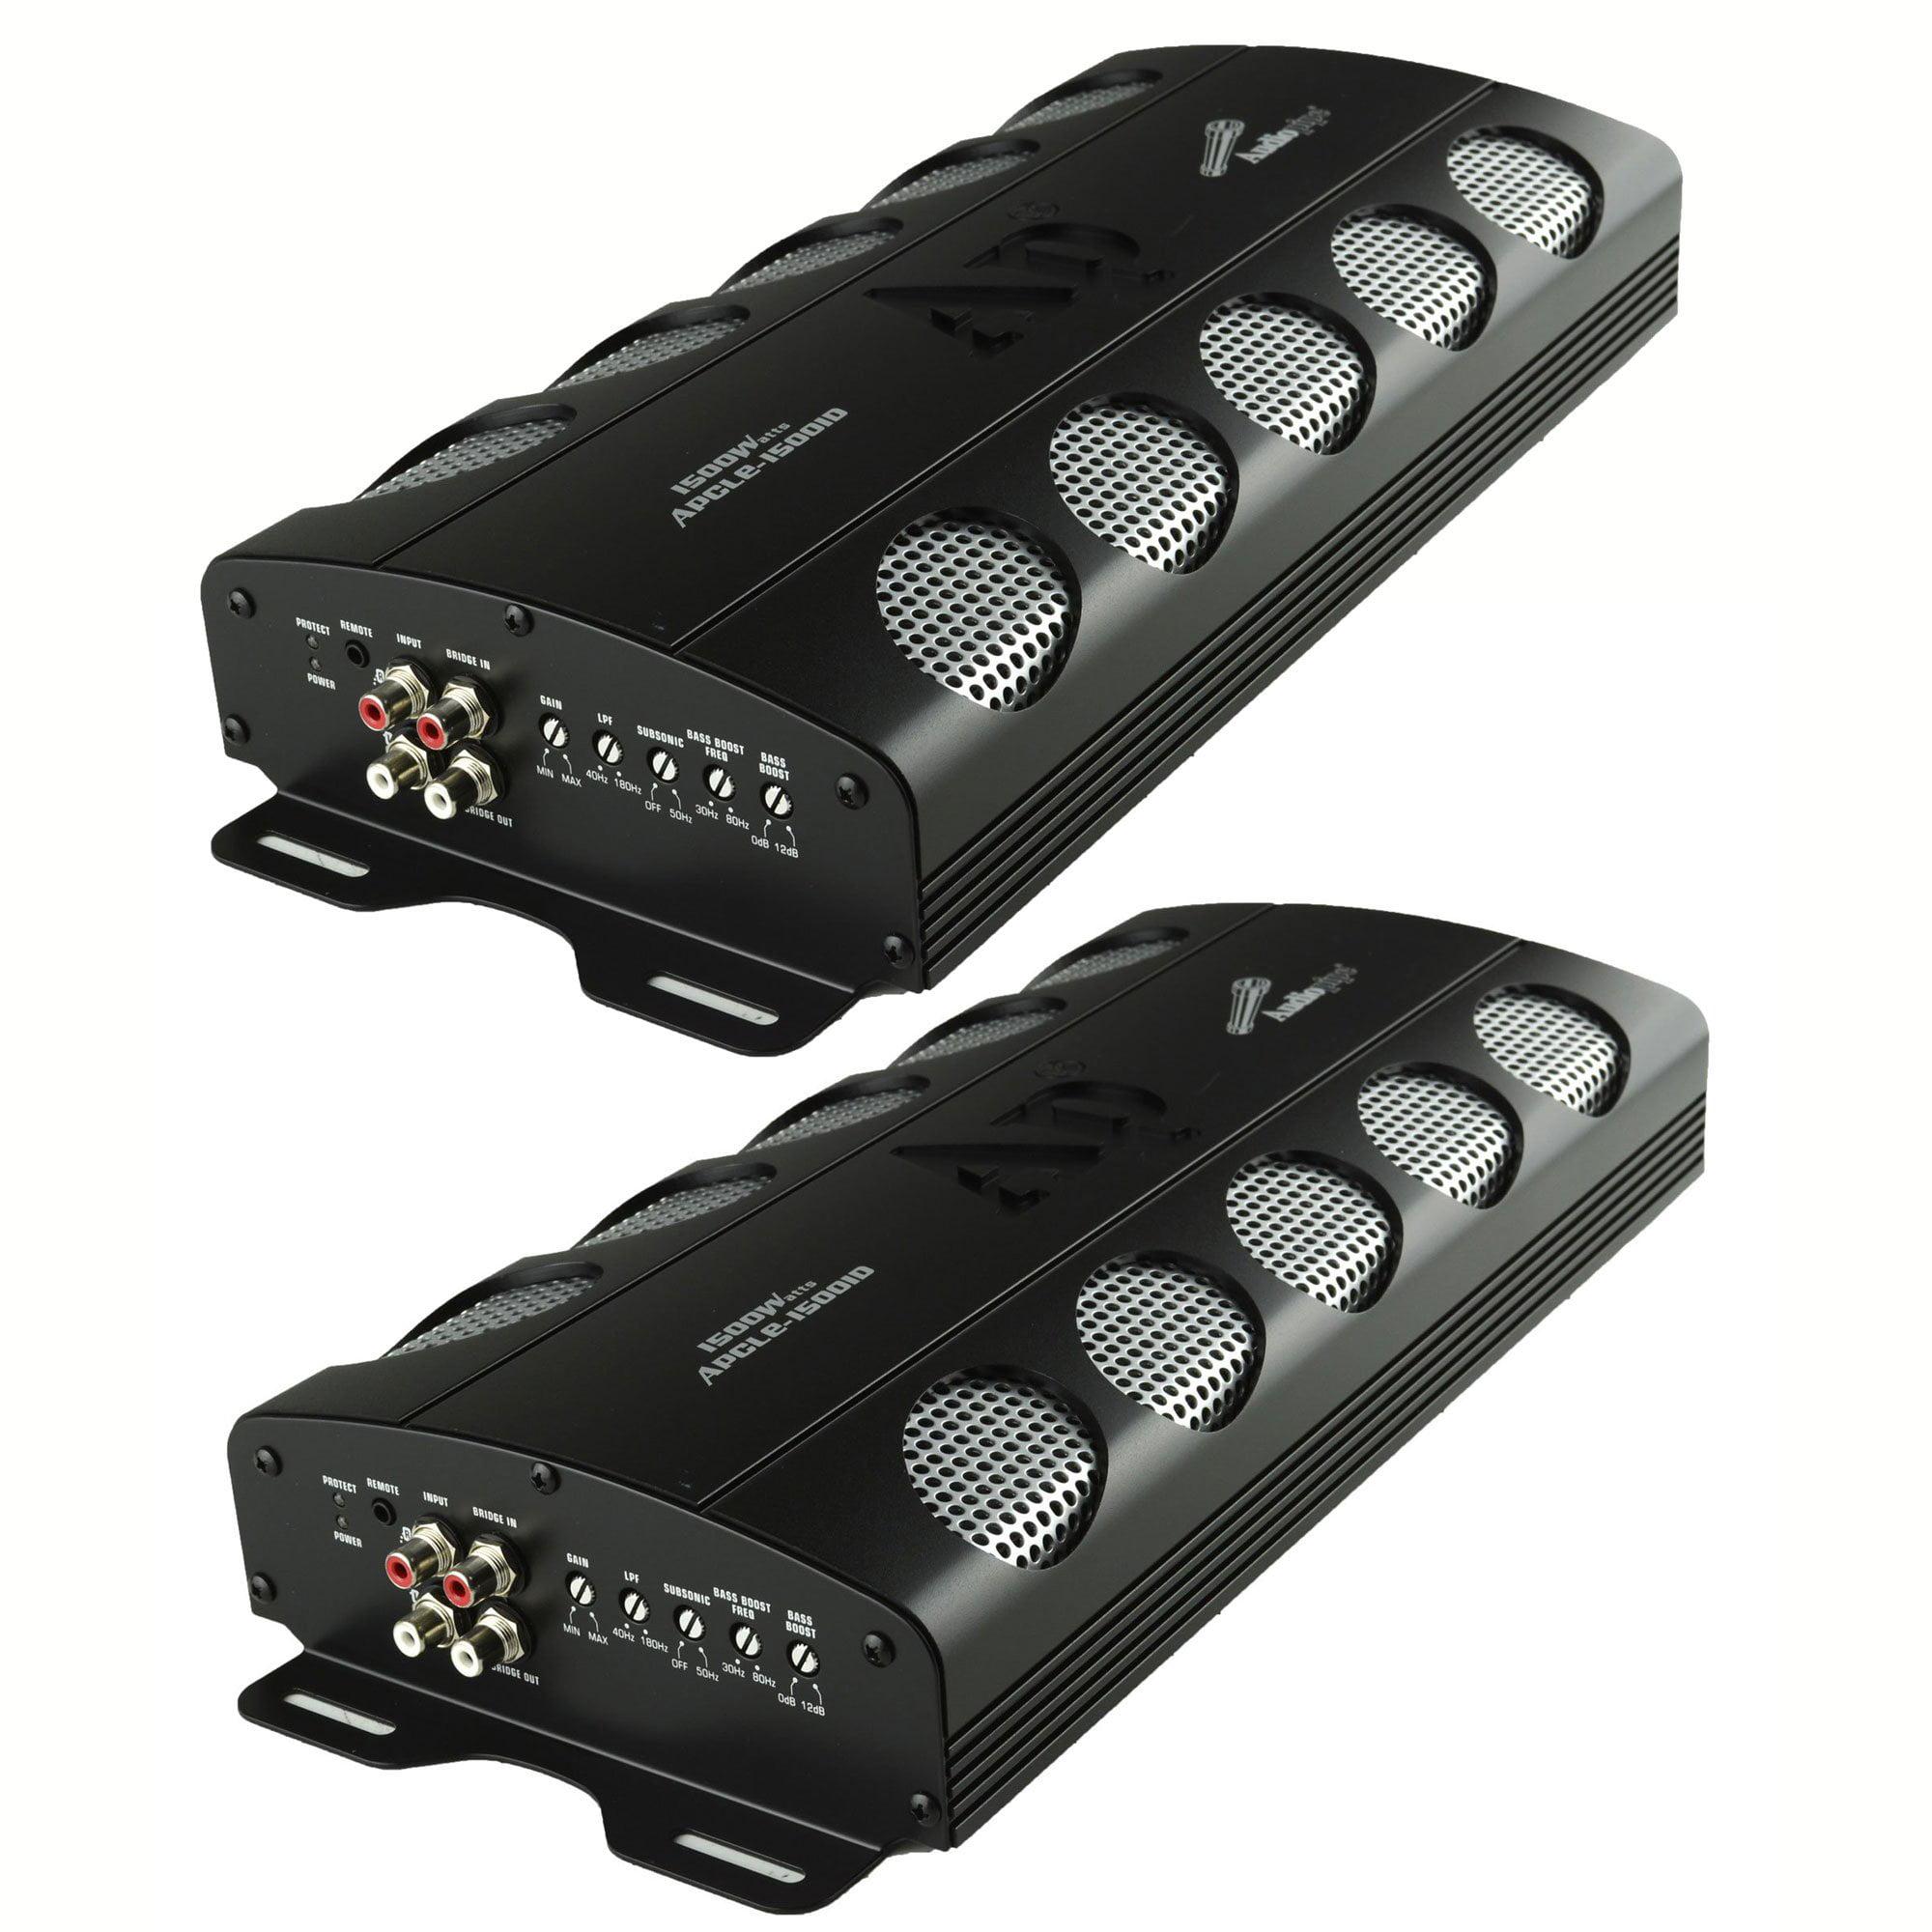 Audiopipe APCLE 1500 Watt Class D 1 Ohm Stable Car Audio Mono Amplifier (2 Pack)